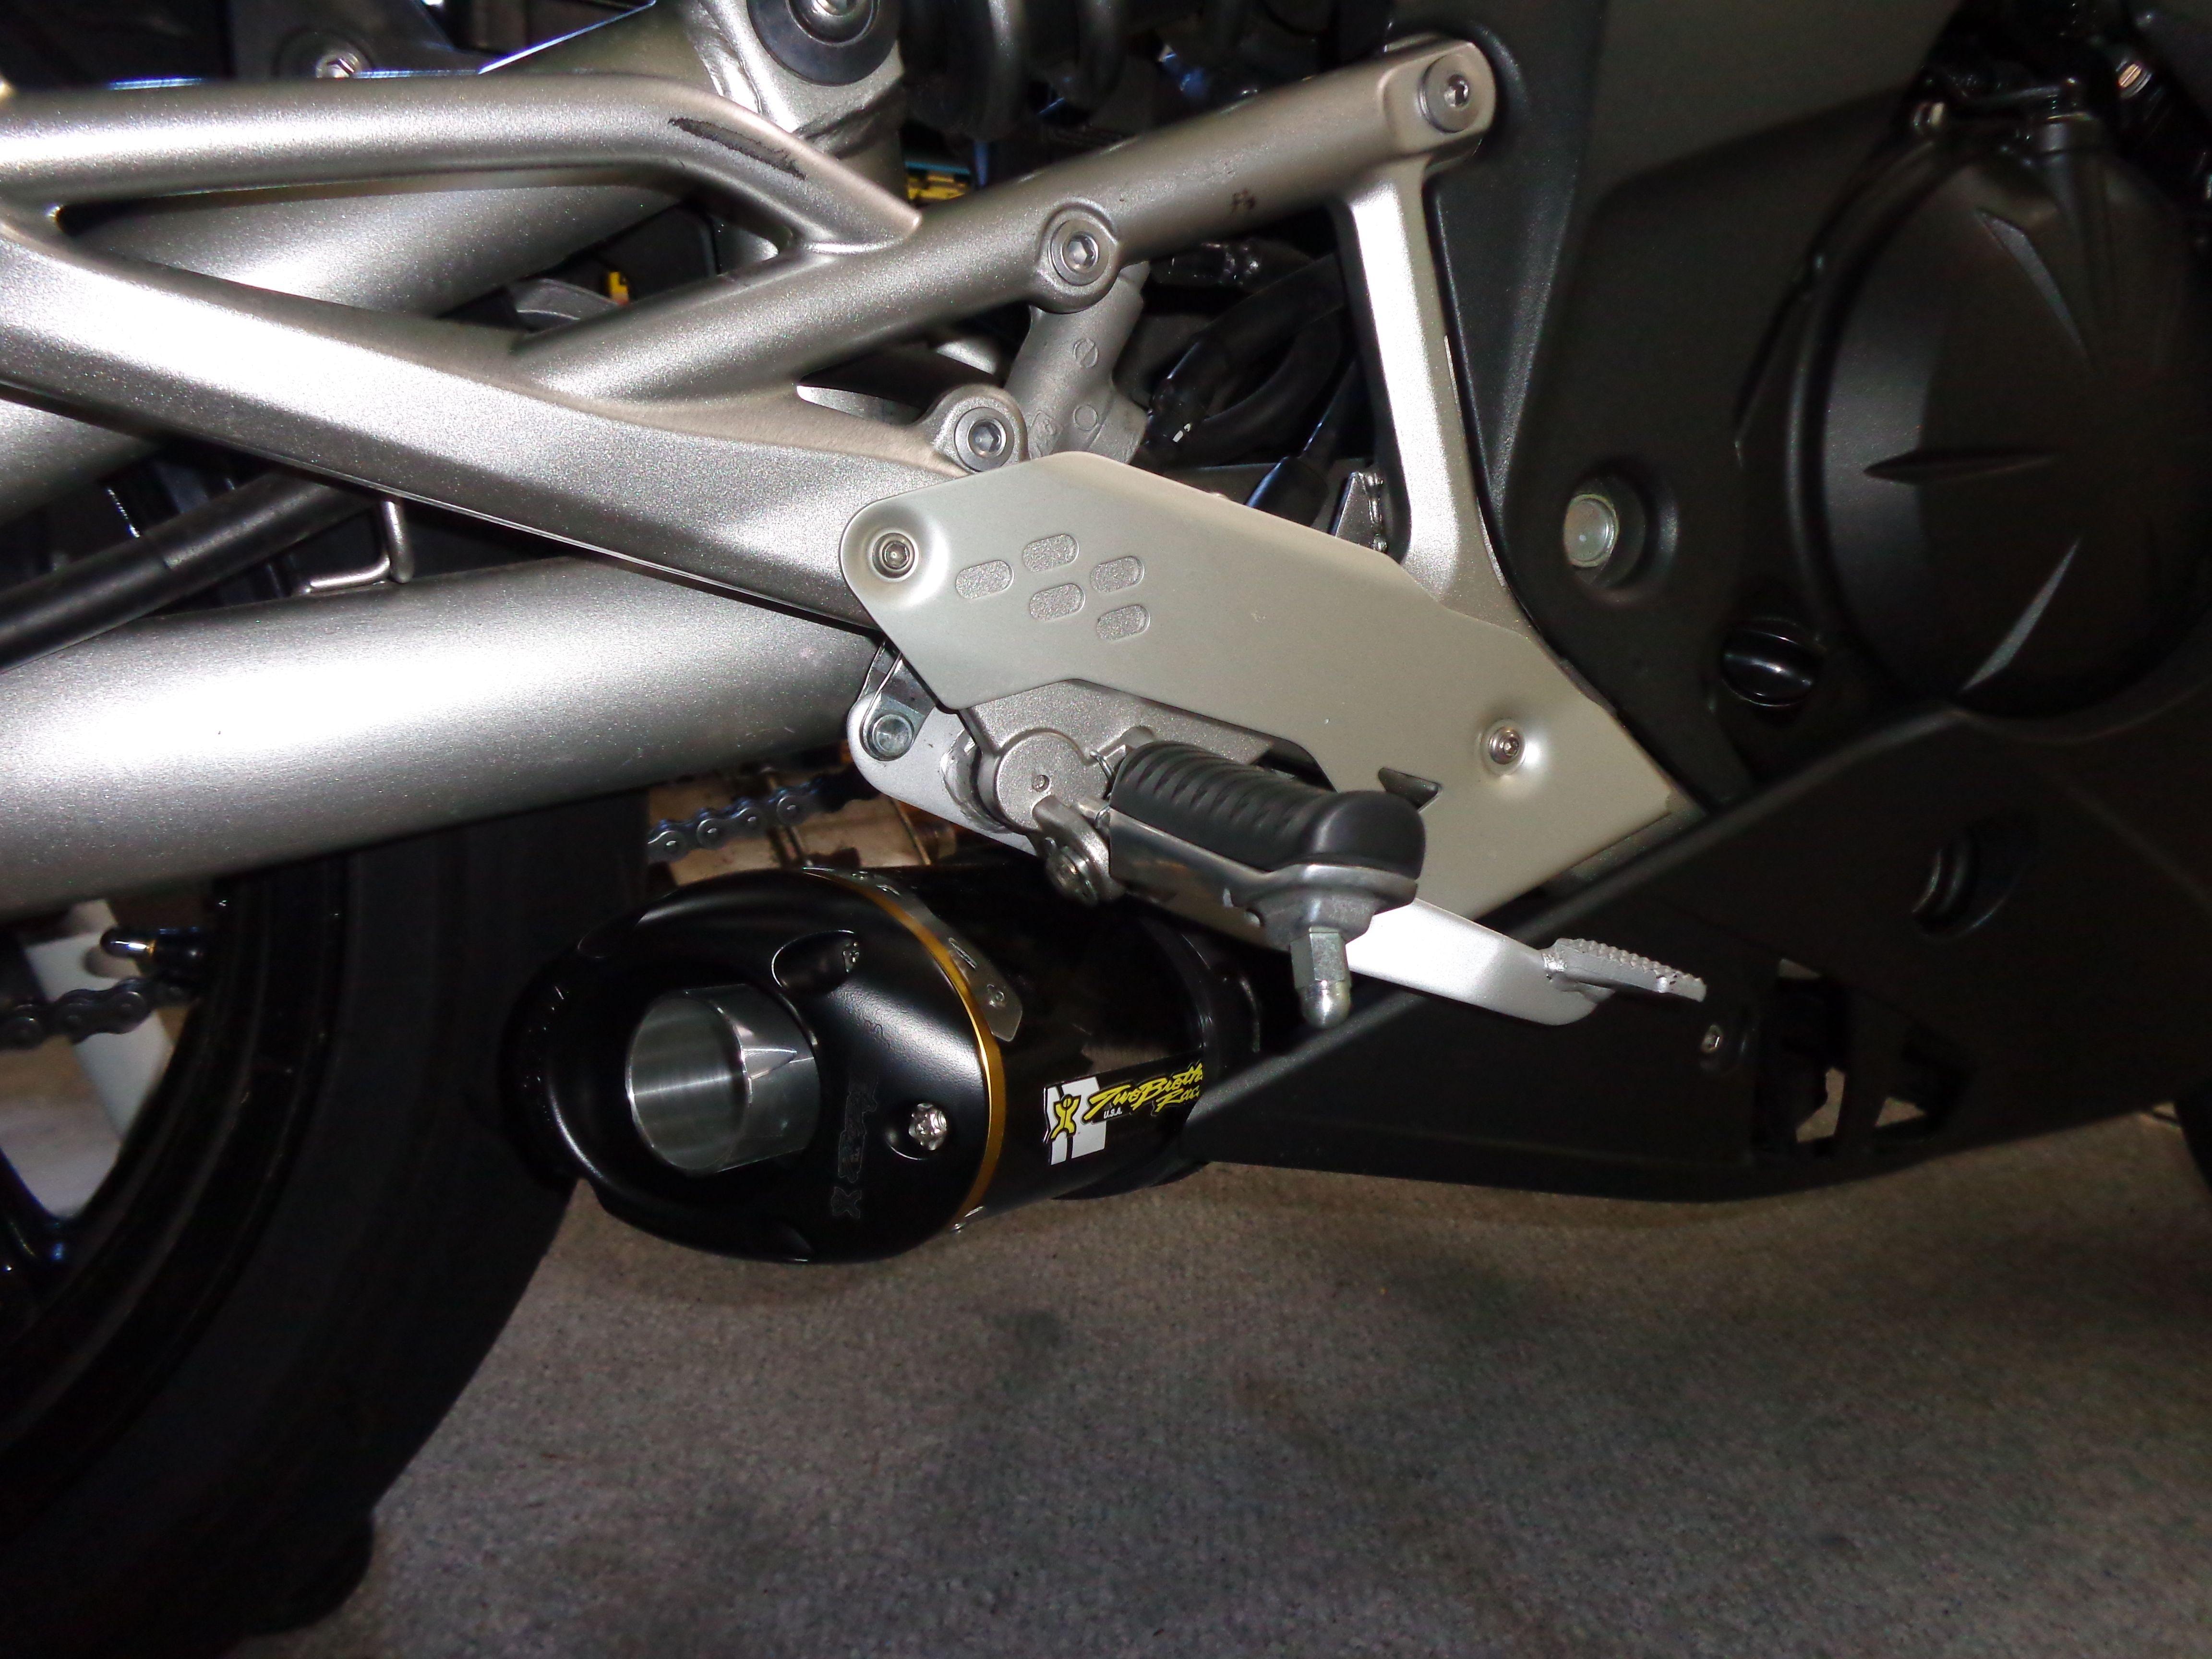 TwoBrothers Carbon Fiber Slip-on exhaust   RiderForums com